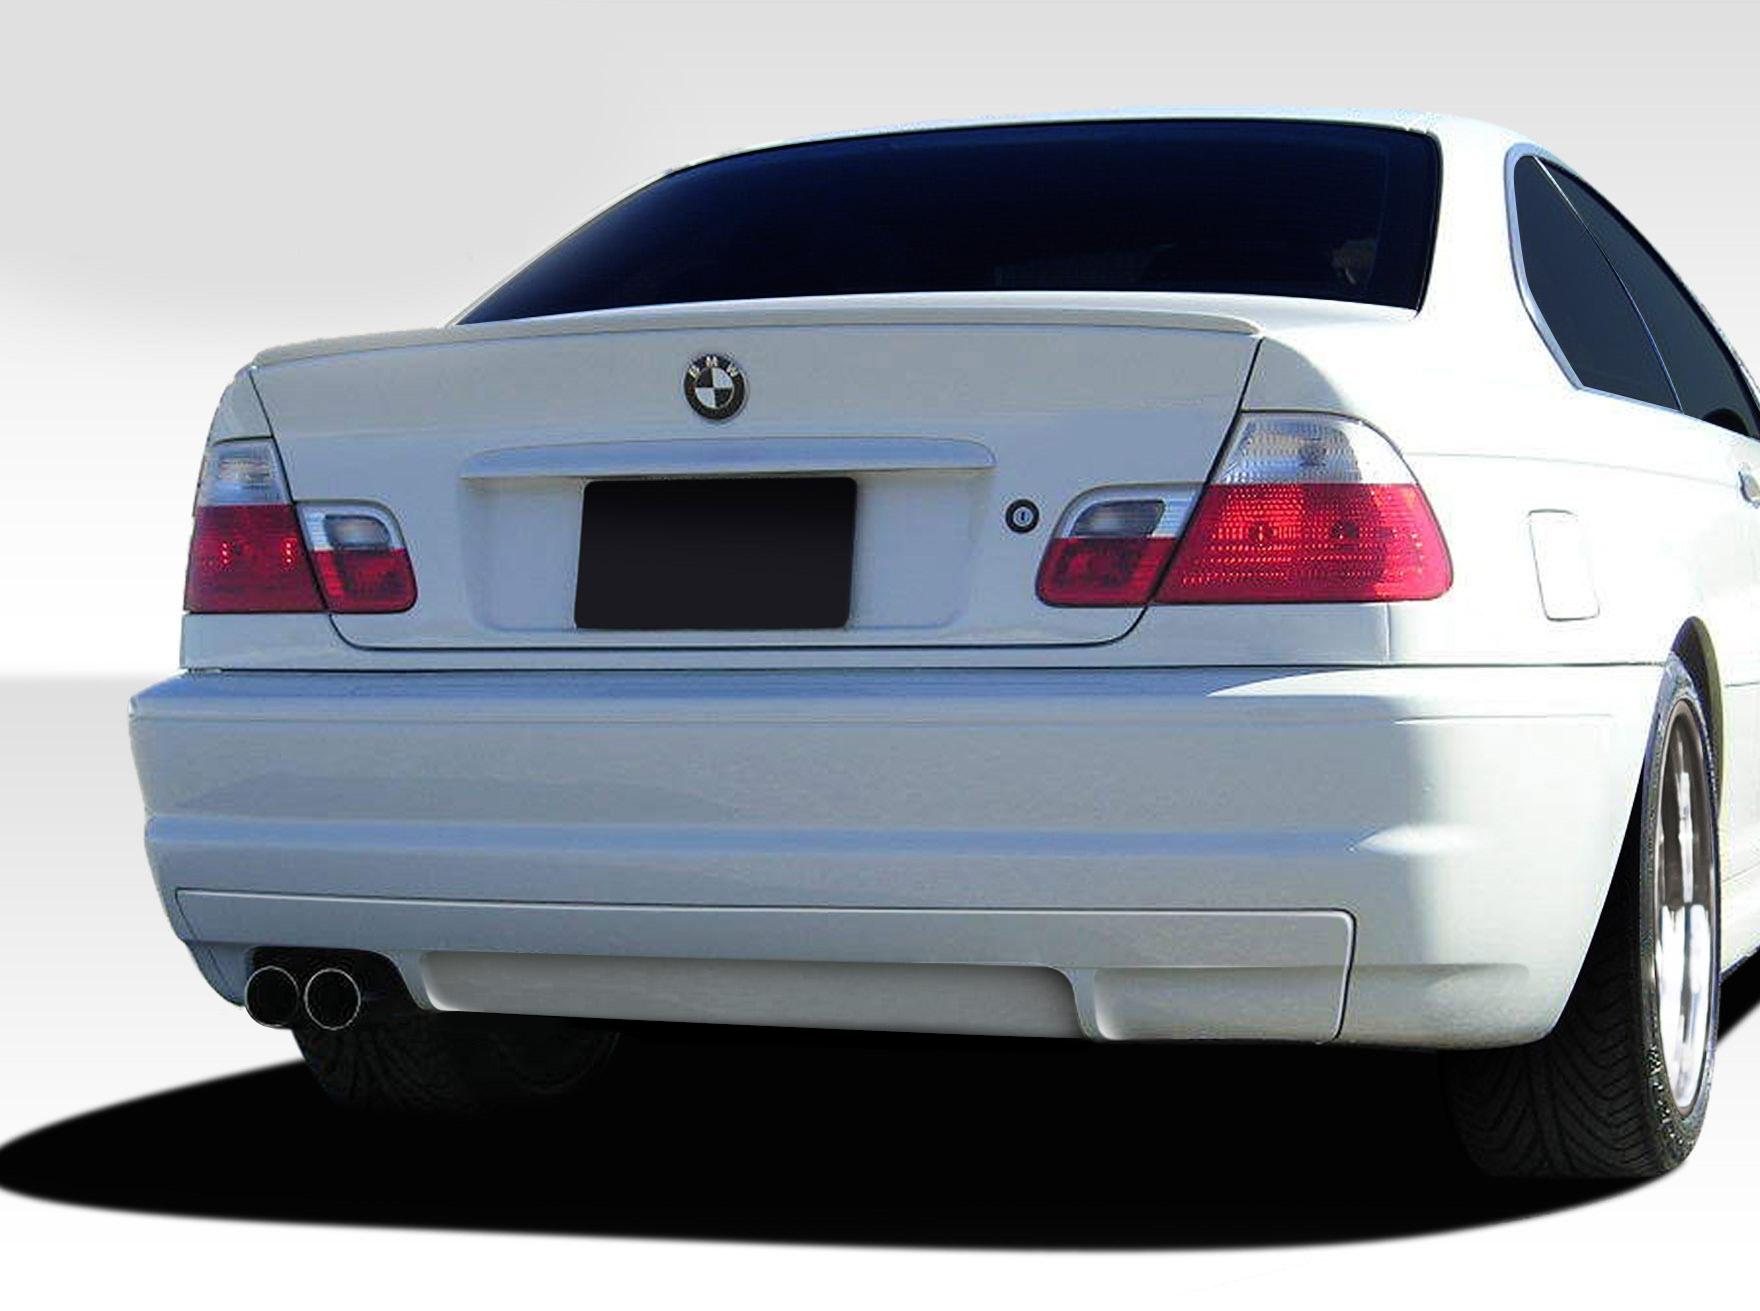 99-06 bmw 3 series csl look duraflex rear body kit bumper!!! 108623